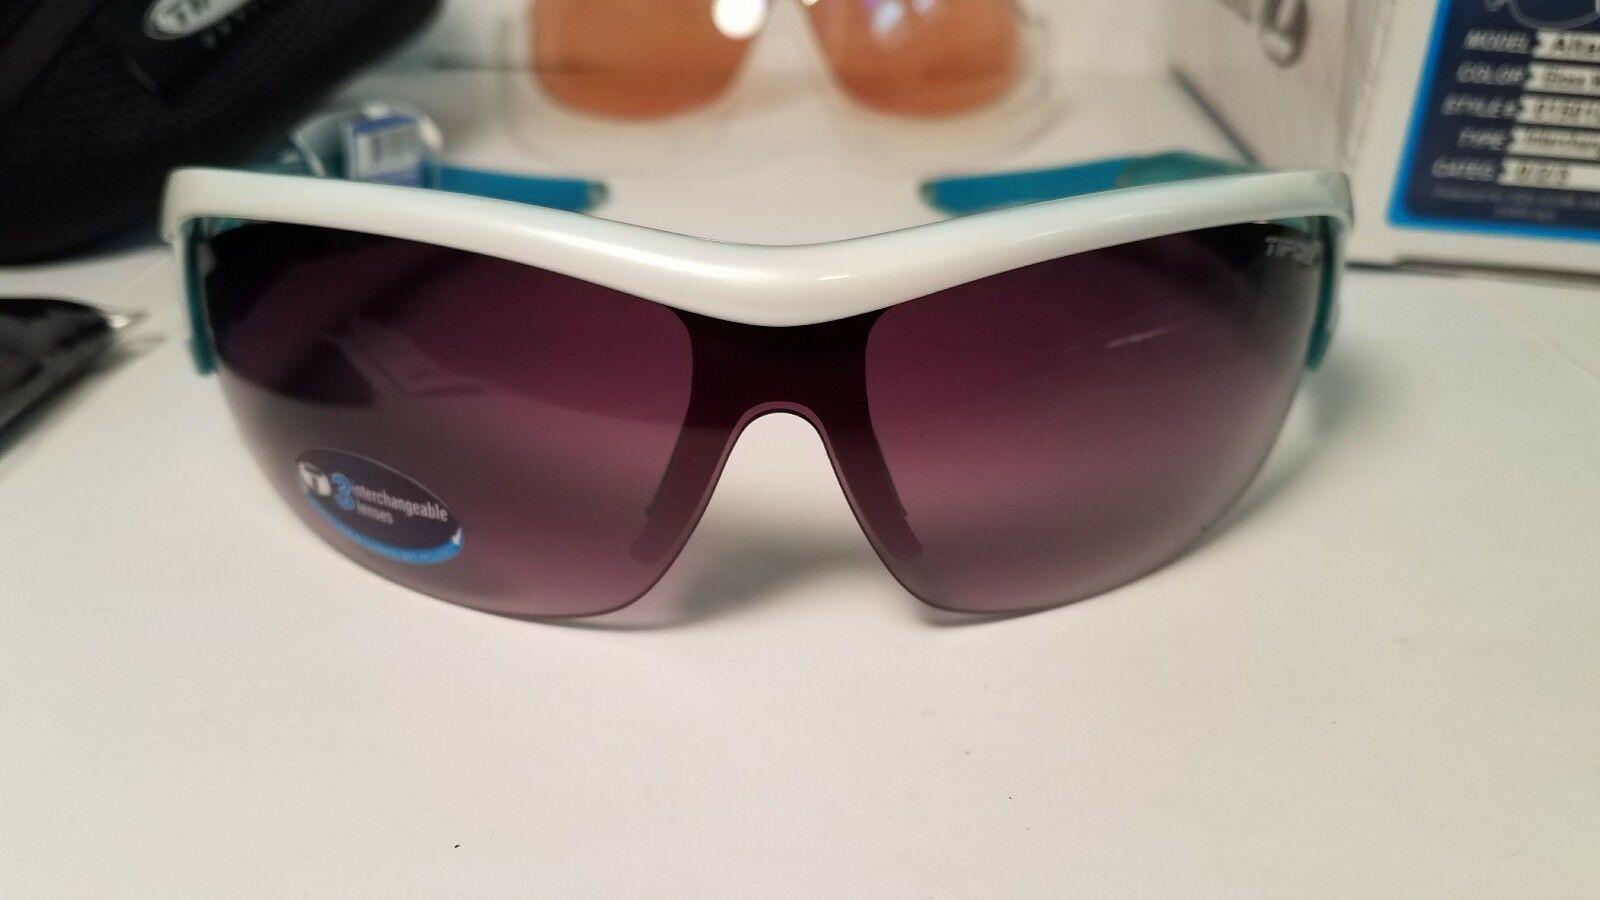 Tifosi - Altar- Gloss White   Teal - Sunglasses